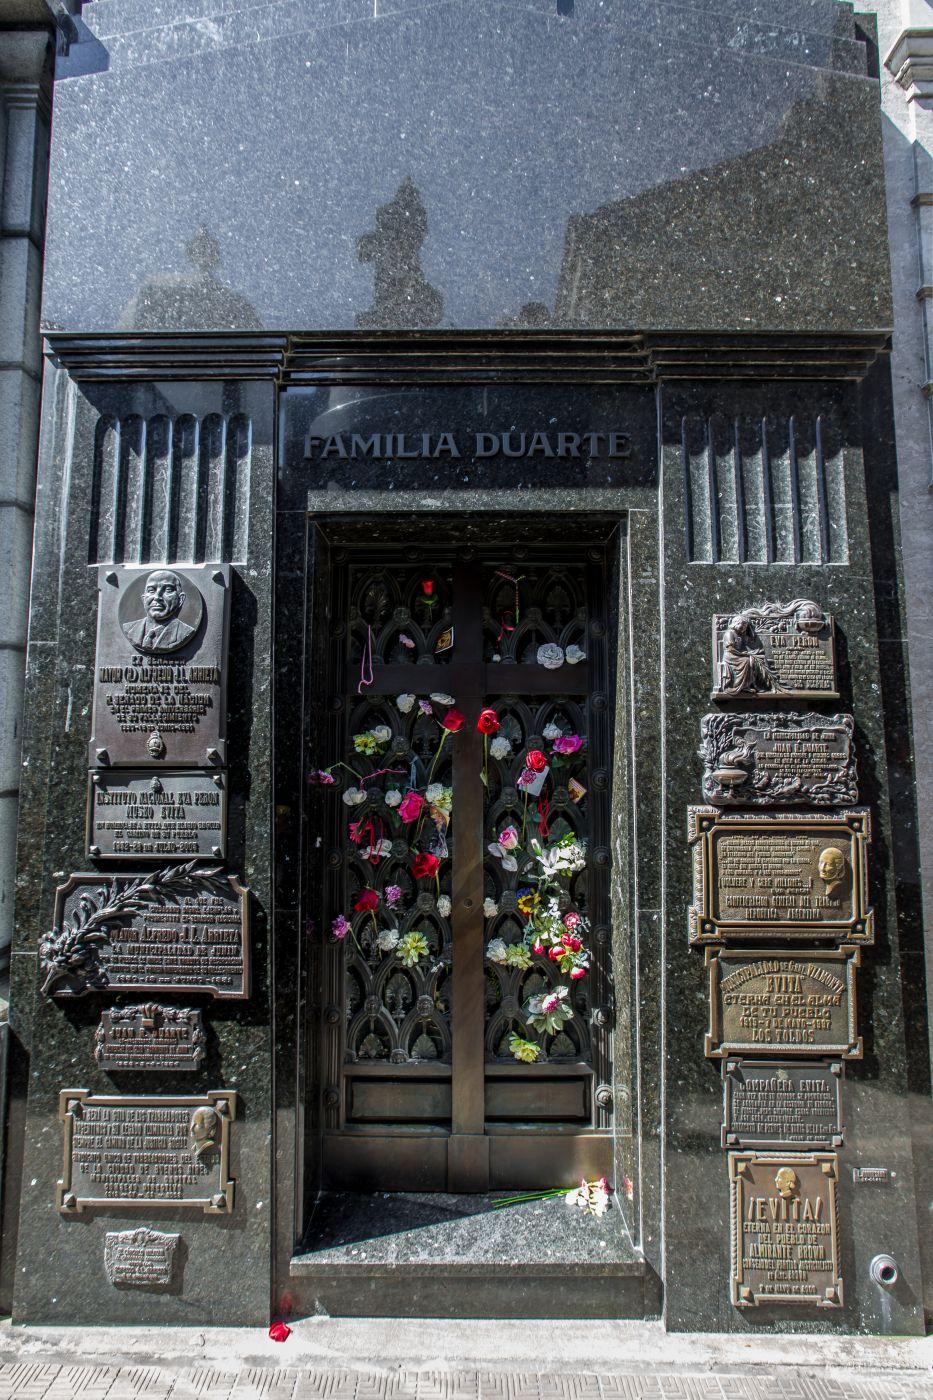 Evitas / Eva Perón's tomb, Argentina